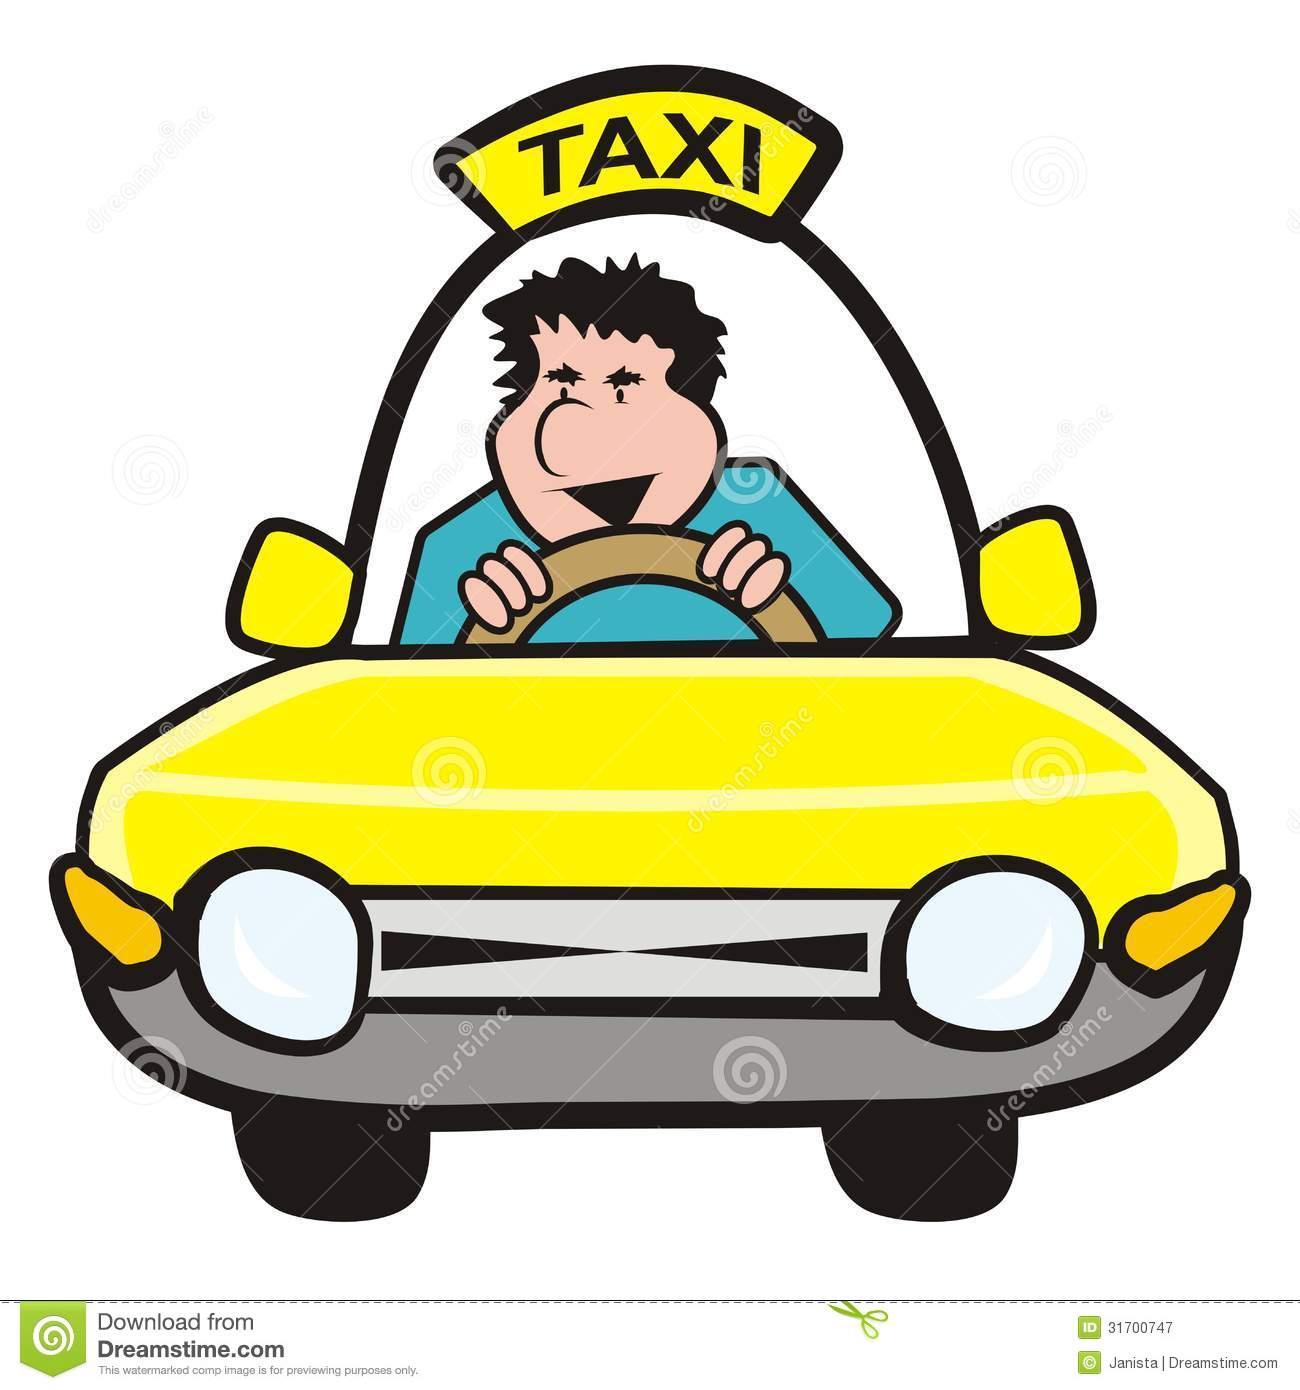 Cab driver clipart svg download 26+ Taxi Driver Clipart | ClipartLook svg download